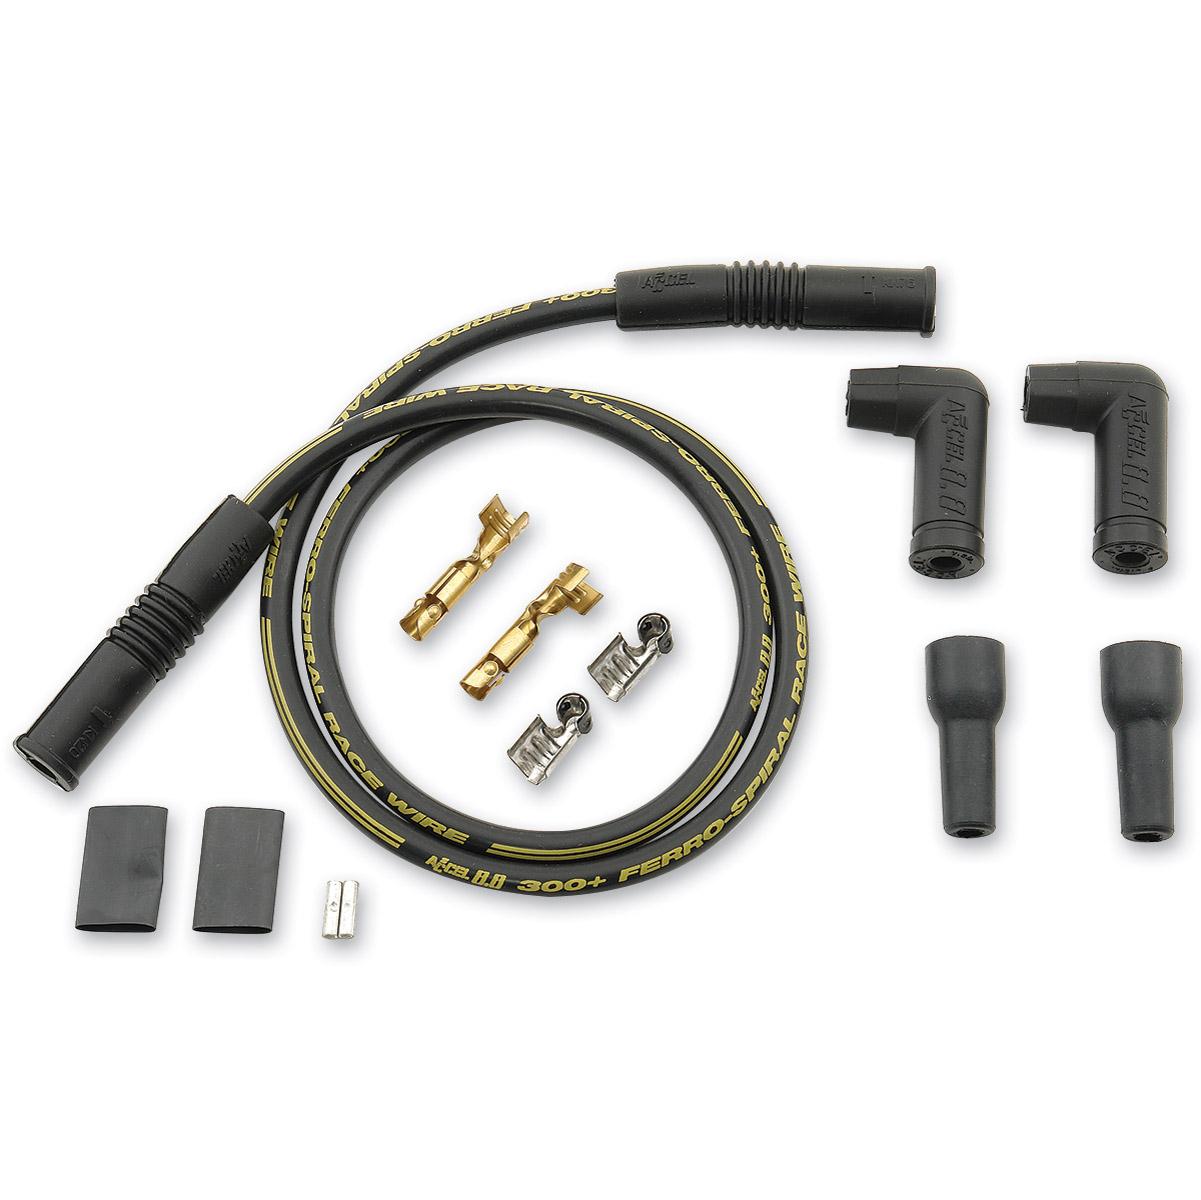 ACCEL '300+' Spark Plug Wire Set